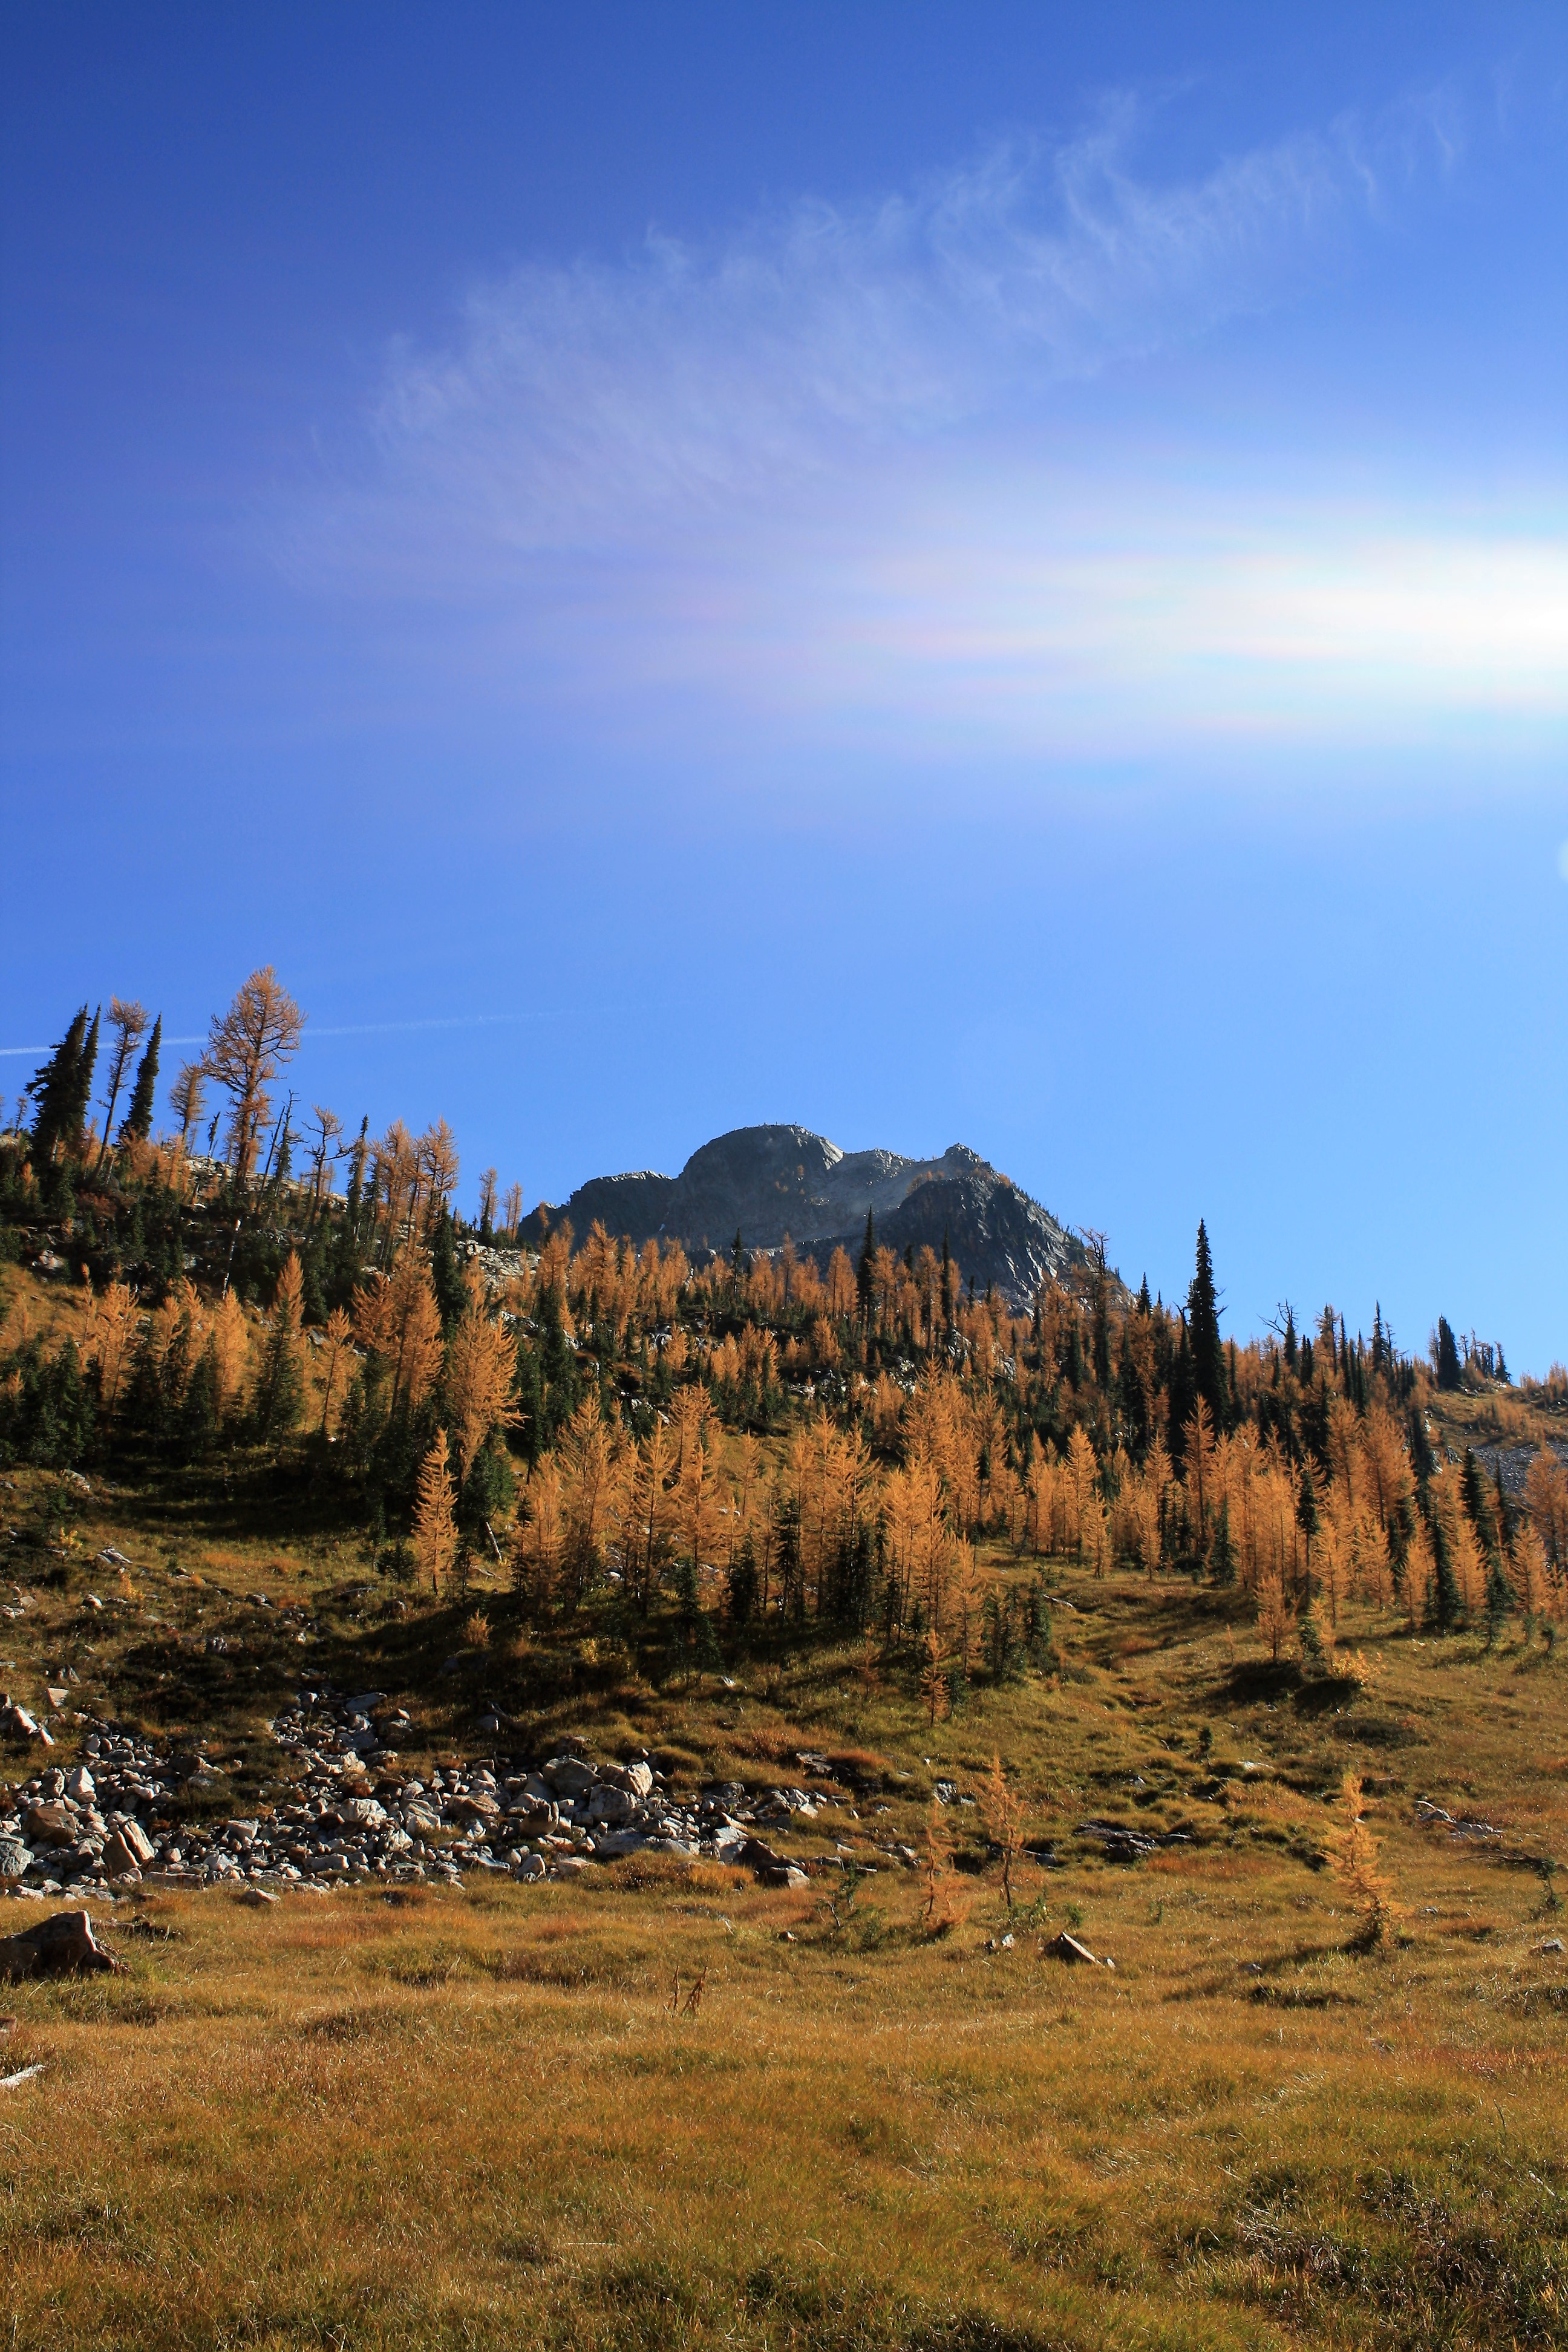 DM_nature_landscape_plaidlake_0441